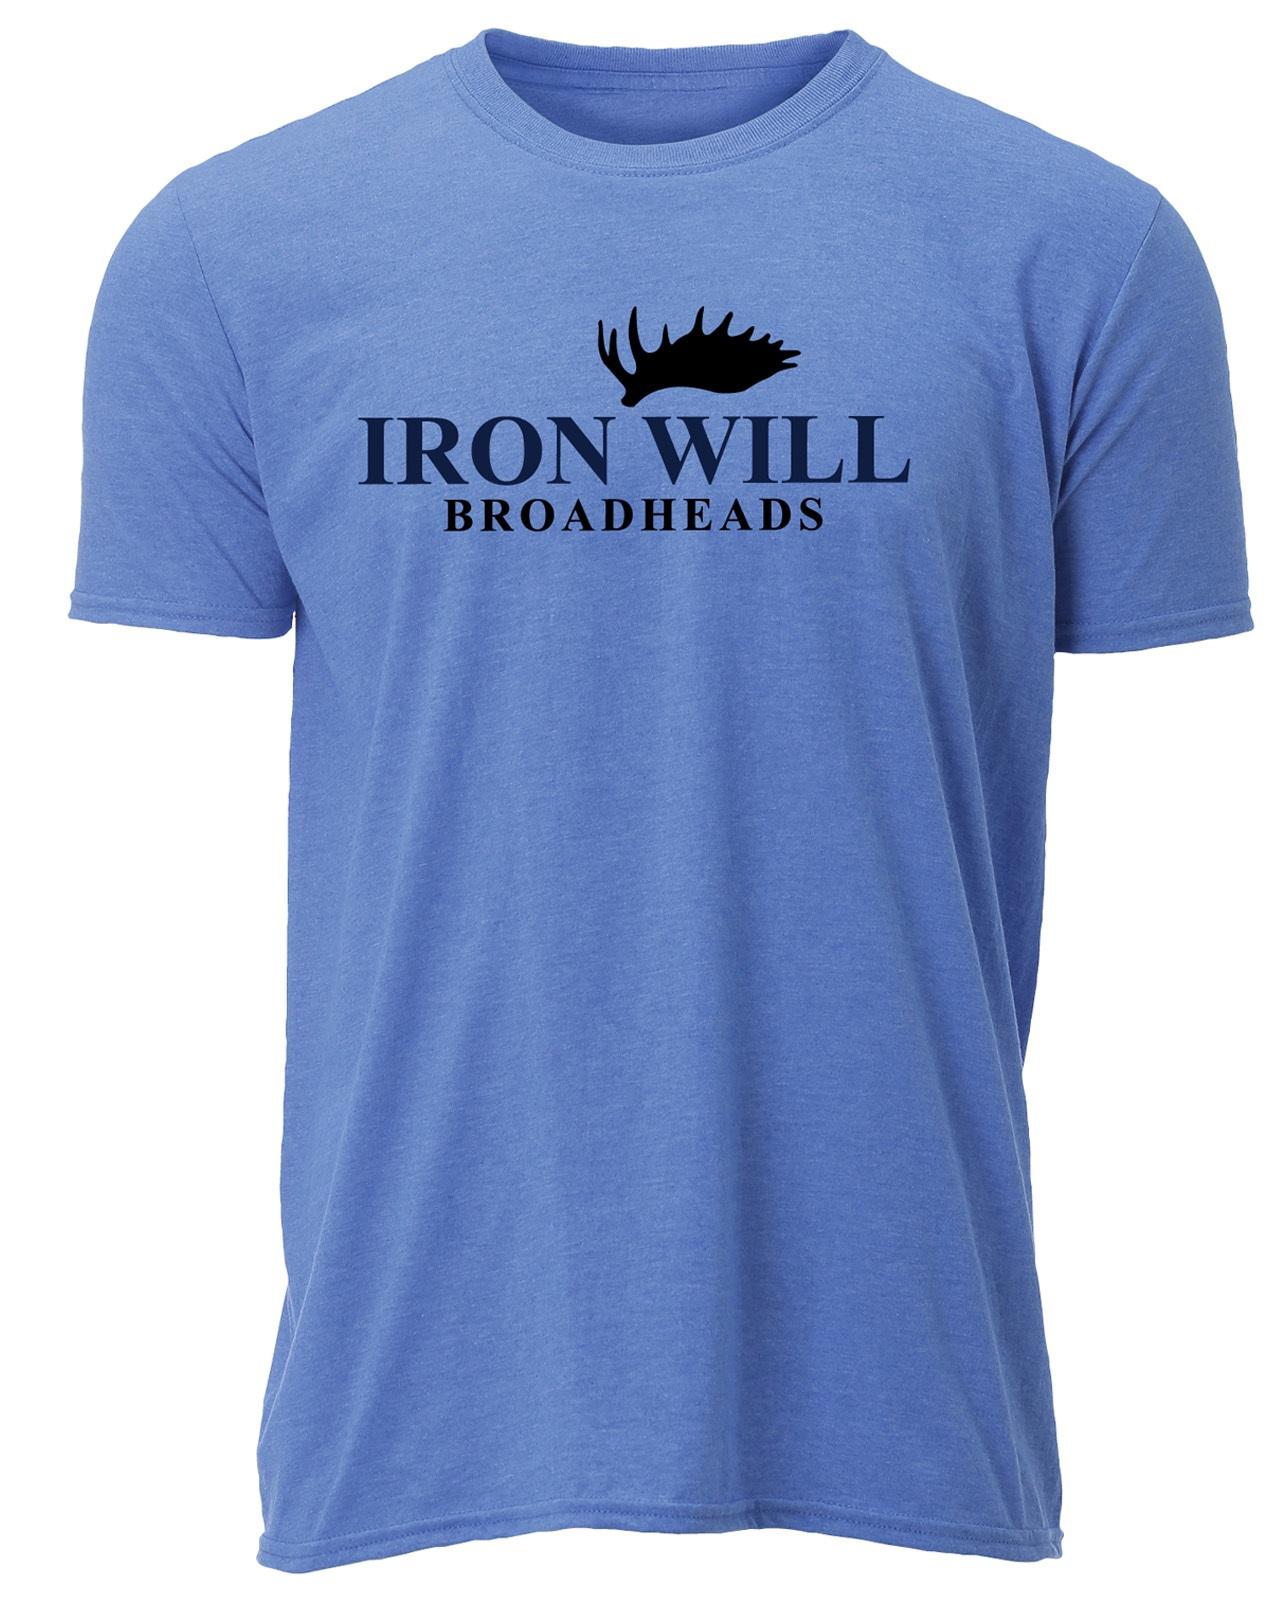 Iron Will Logo T-Shirt - Blue - $24.95